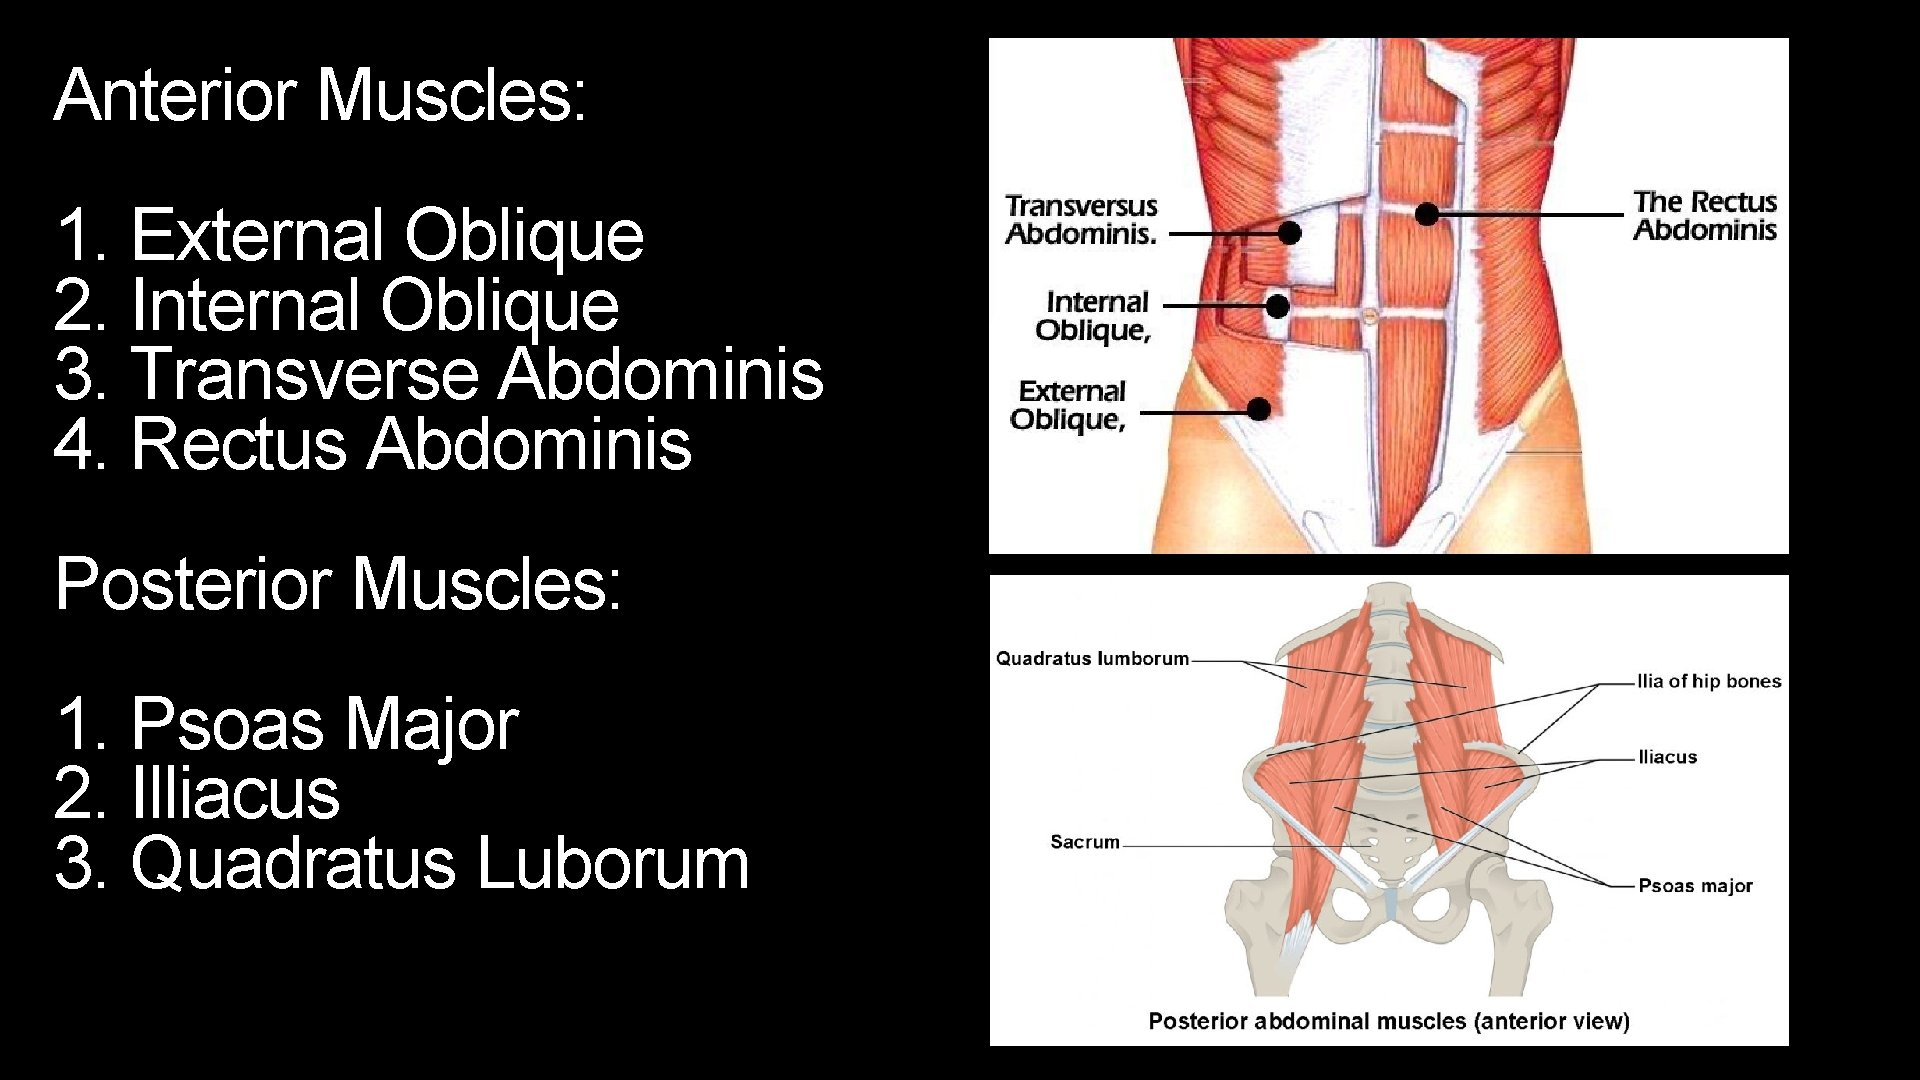 Anterior Muscles: 1. External Oblique 2. Internal Oblique 3. Transverse Abdominis 4. Rectus Abdominis